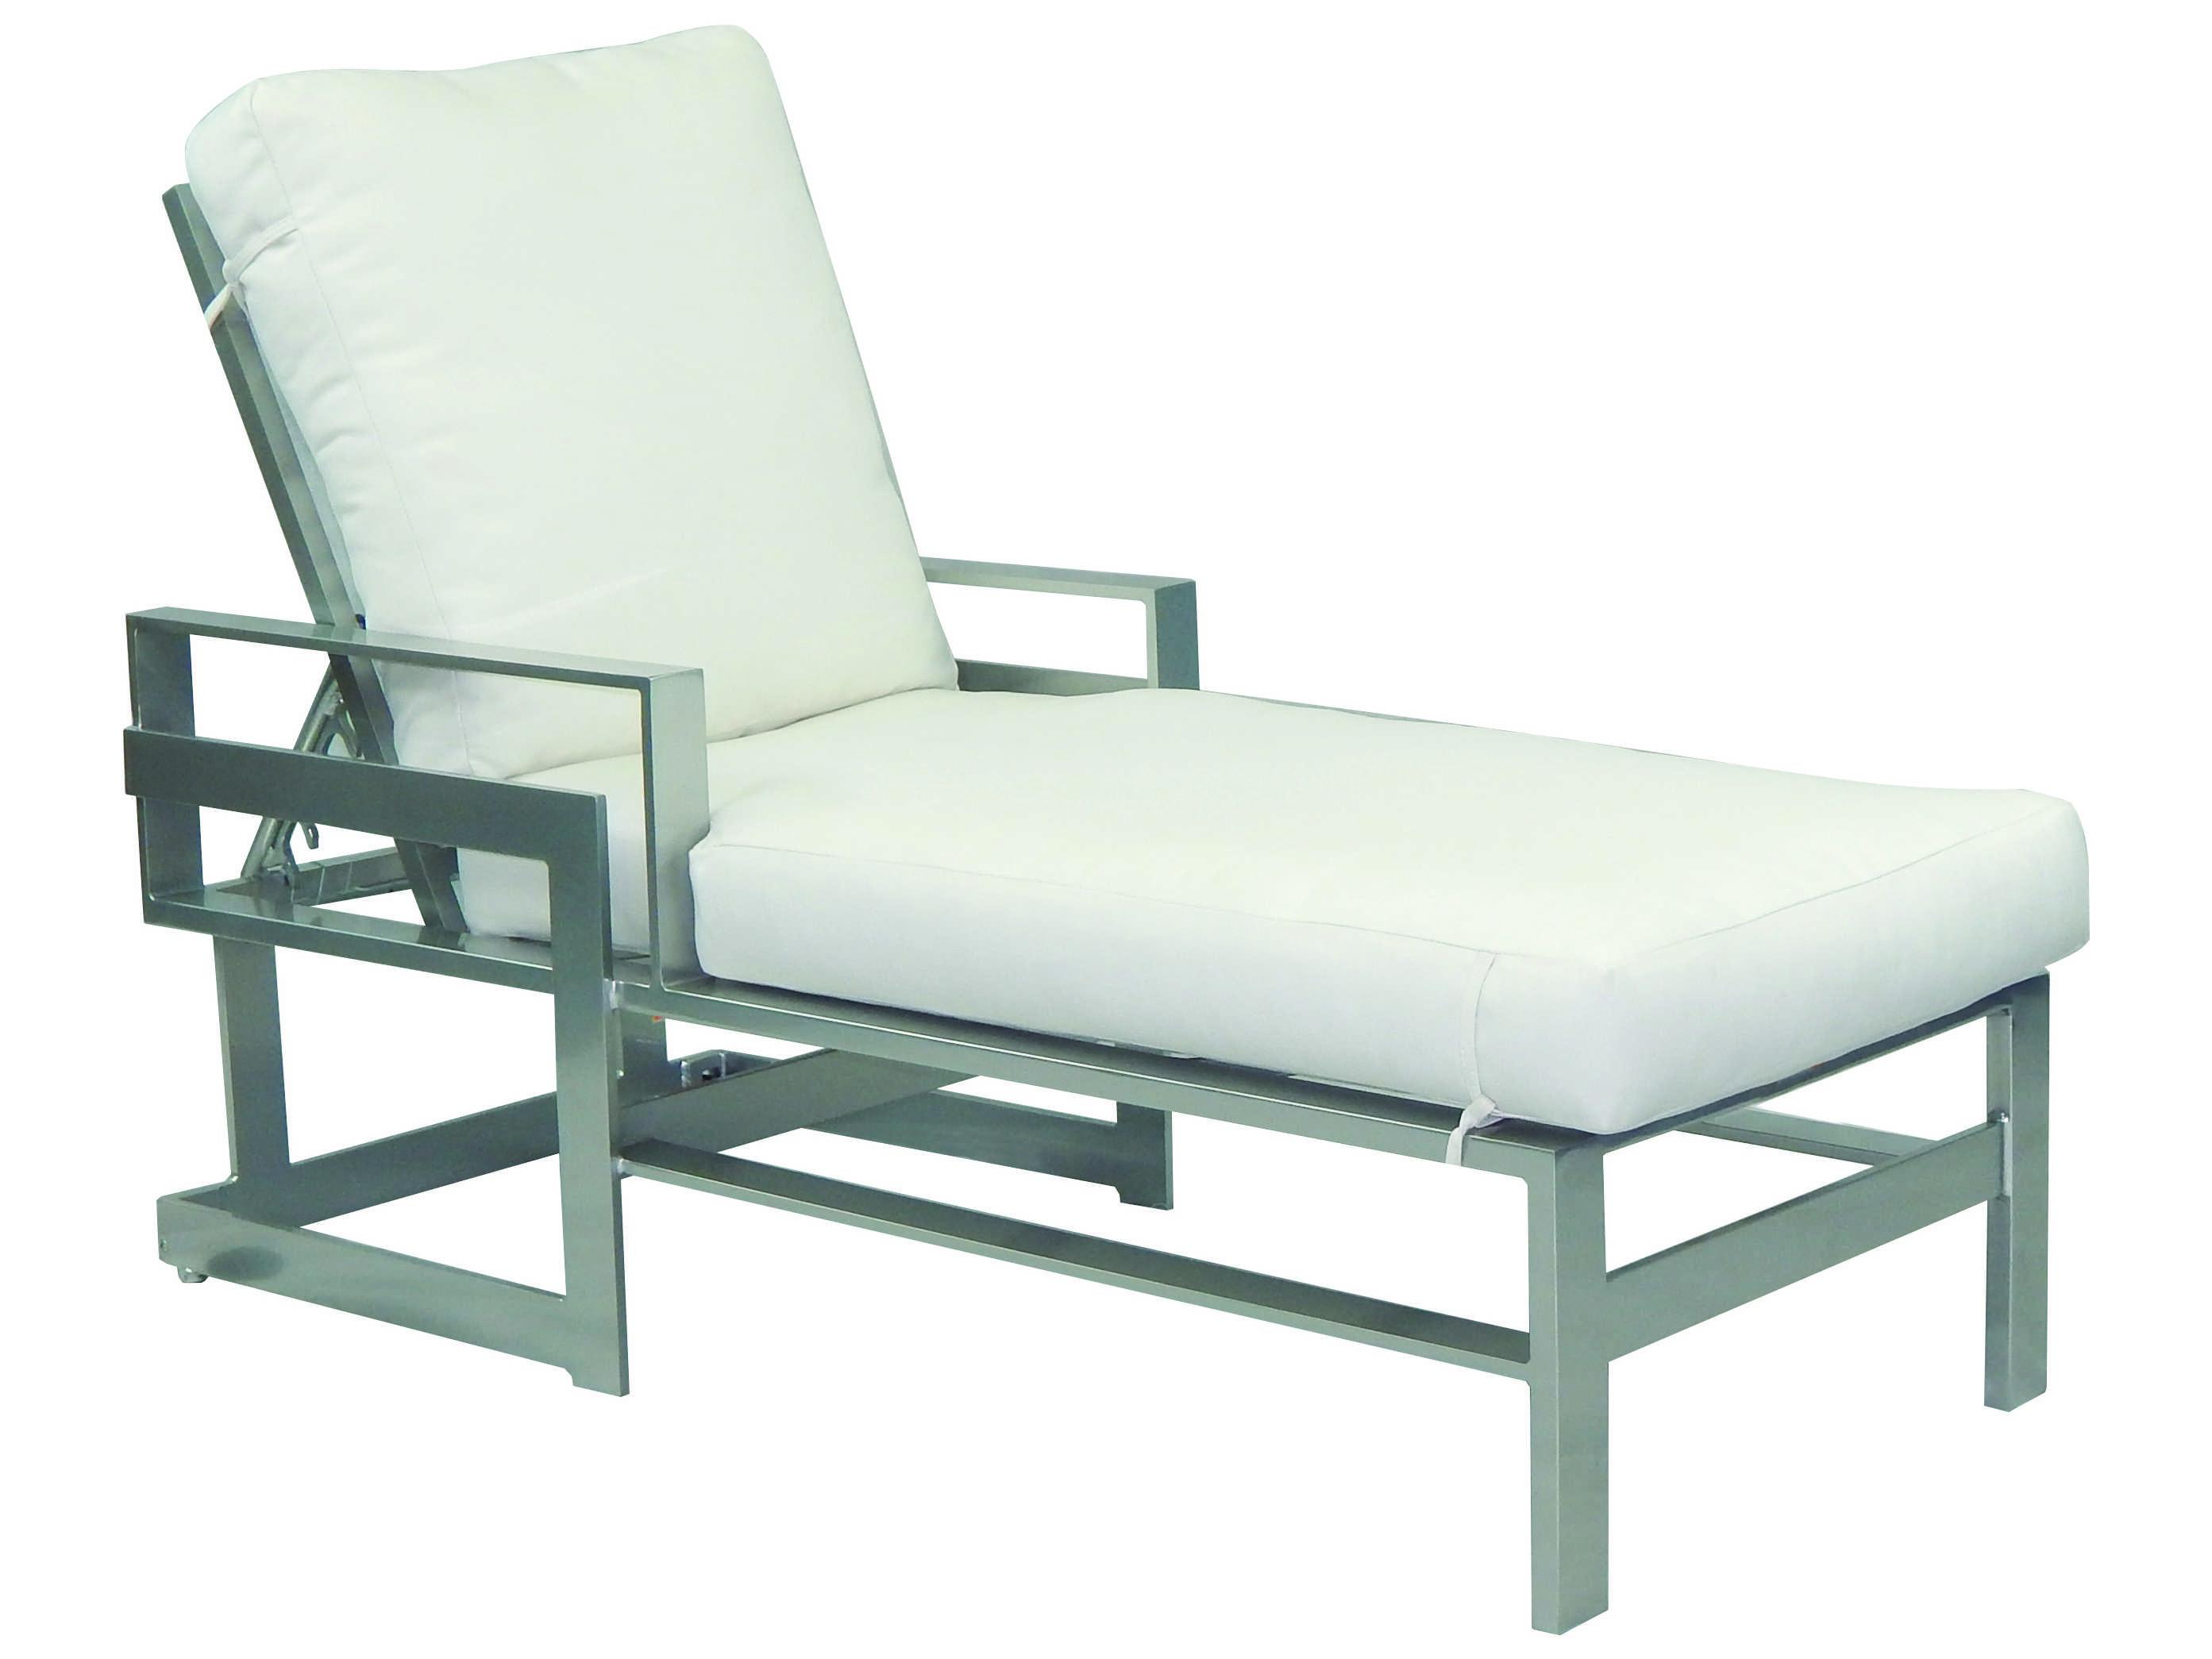 Castelle eclipse cushion dining cast aluminum adjustable for Chaise longue aluminium